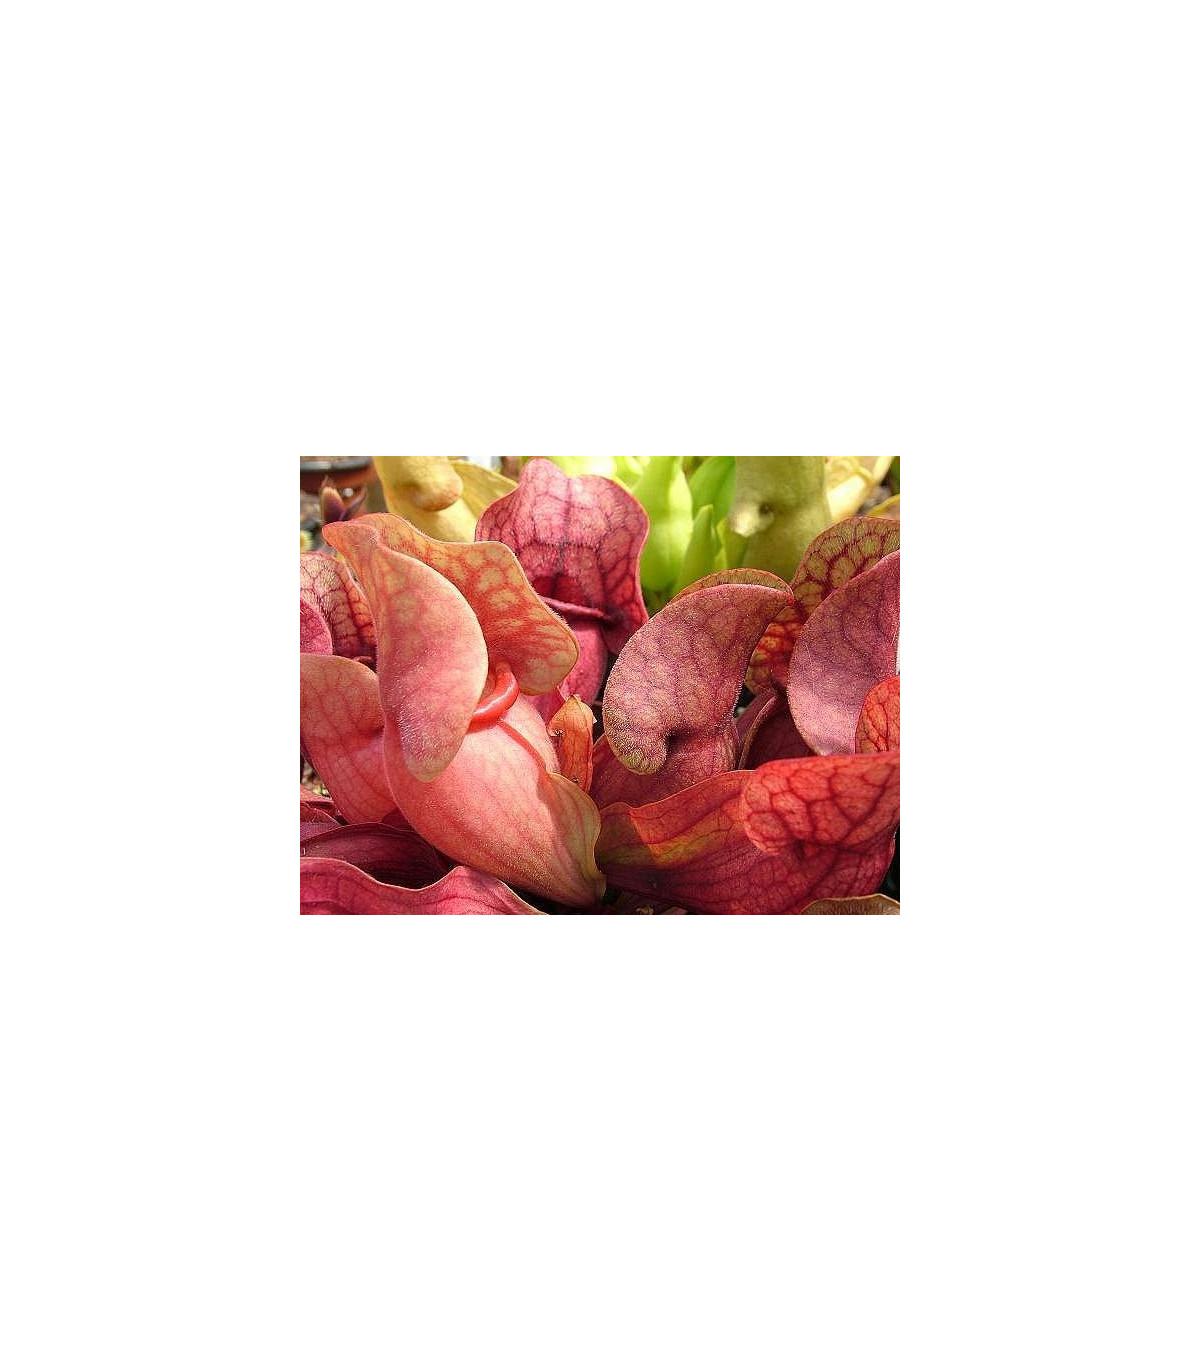 Špirlice nachová extra velká - Sarracenia purpurea - semena špirlice - 12 ks